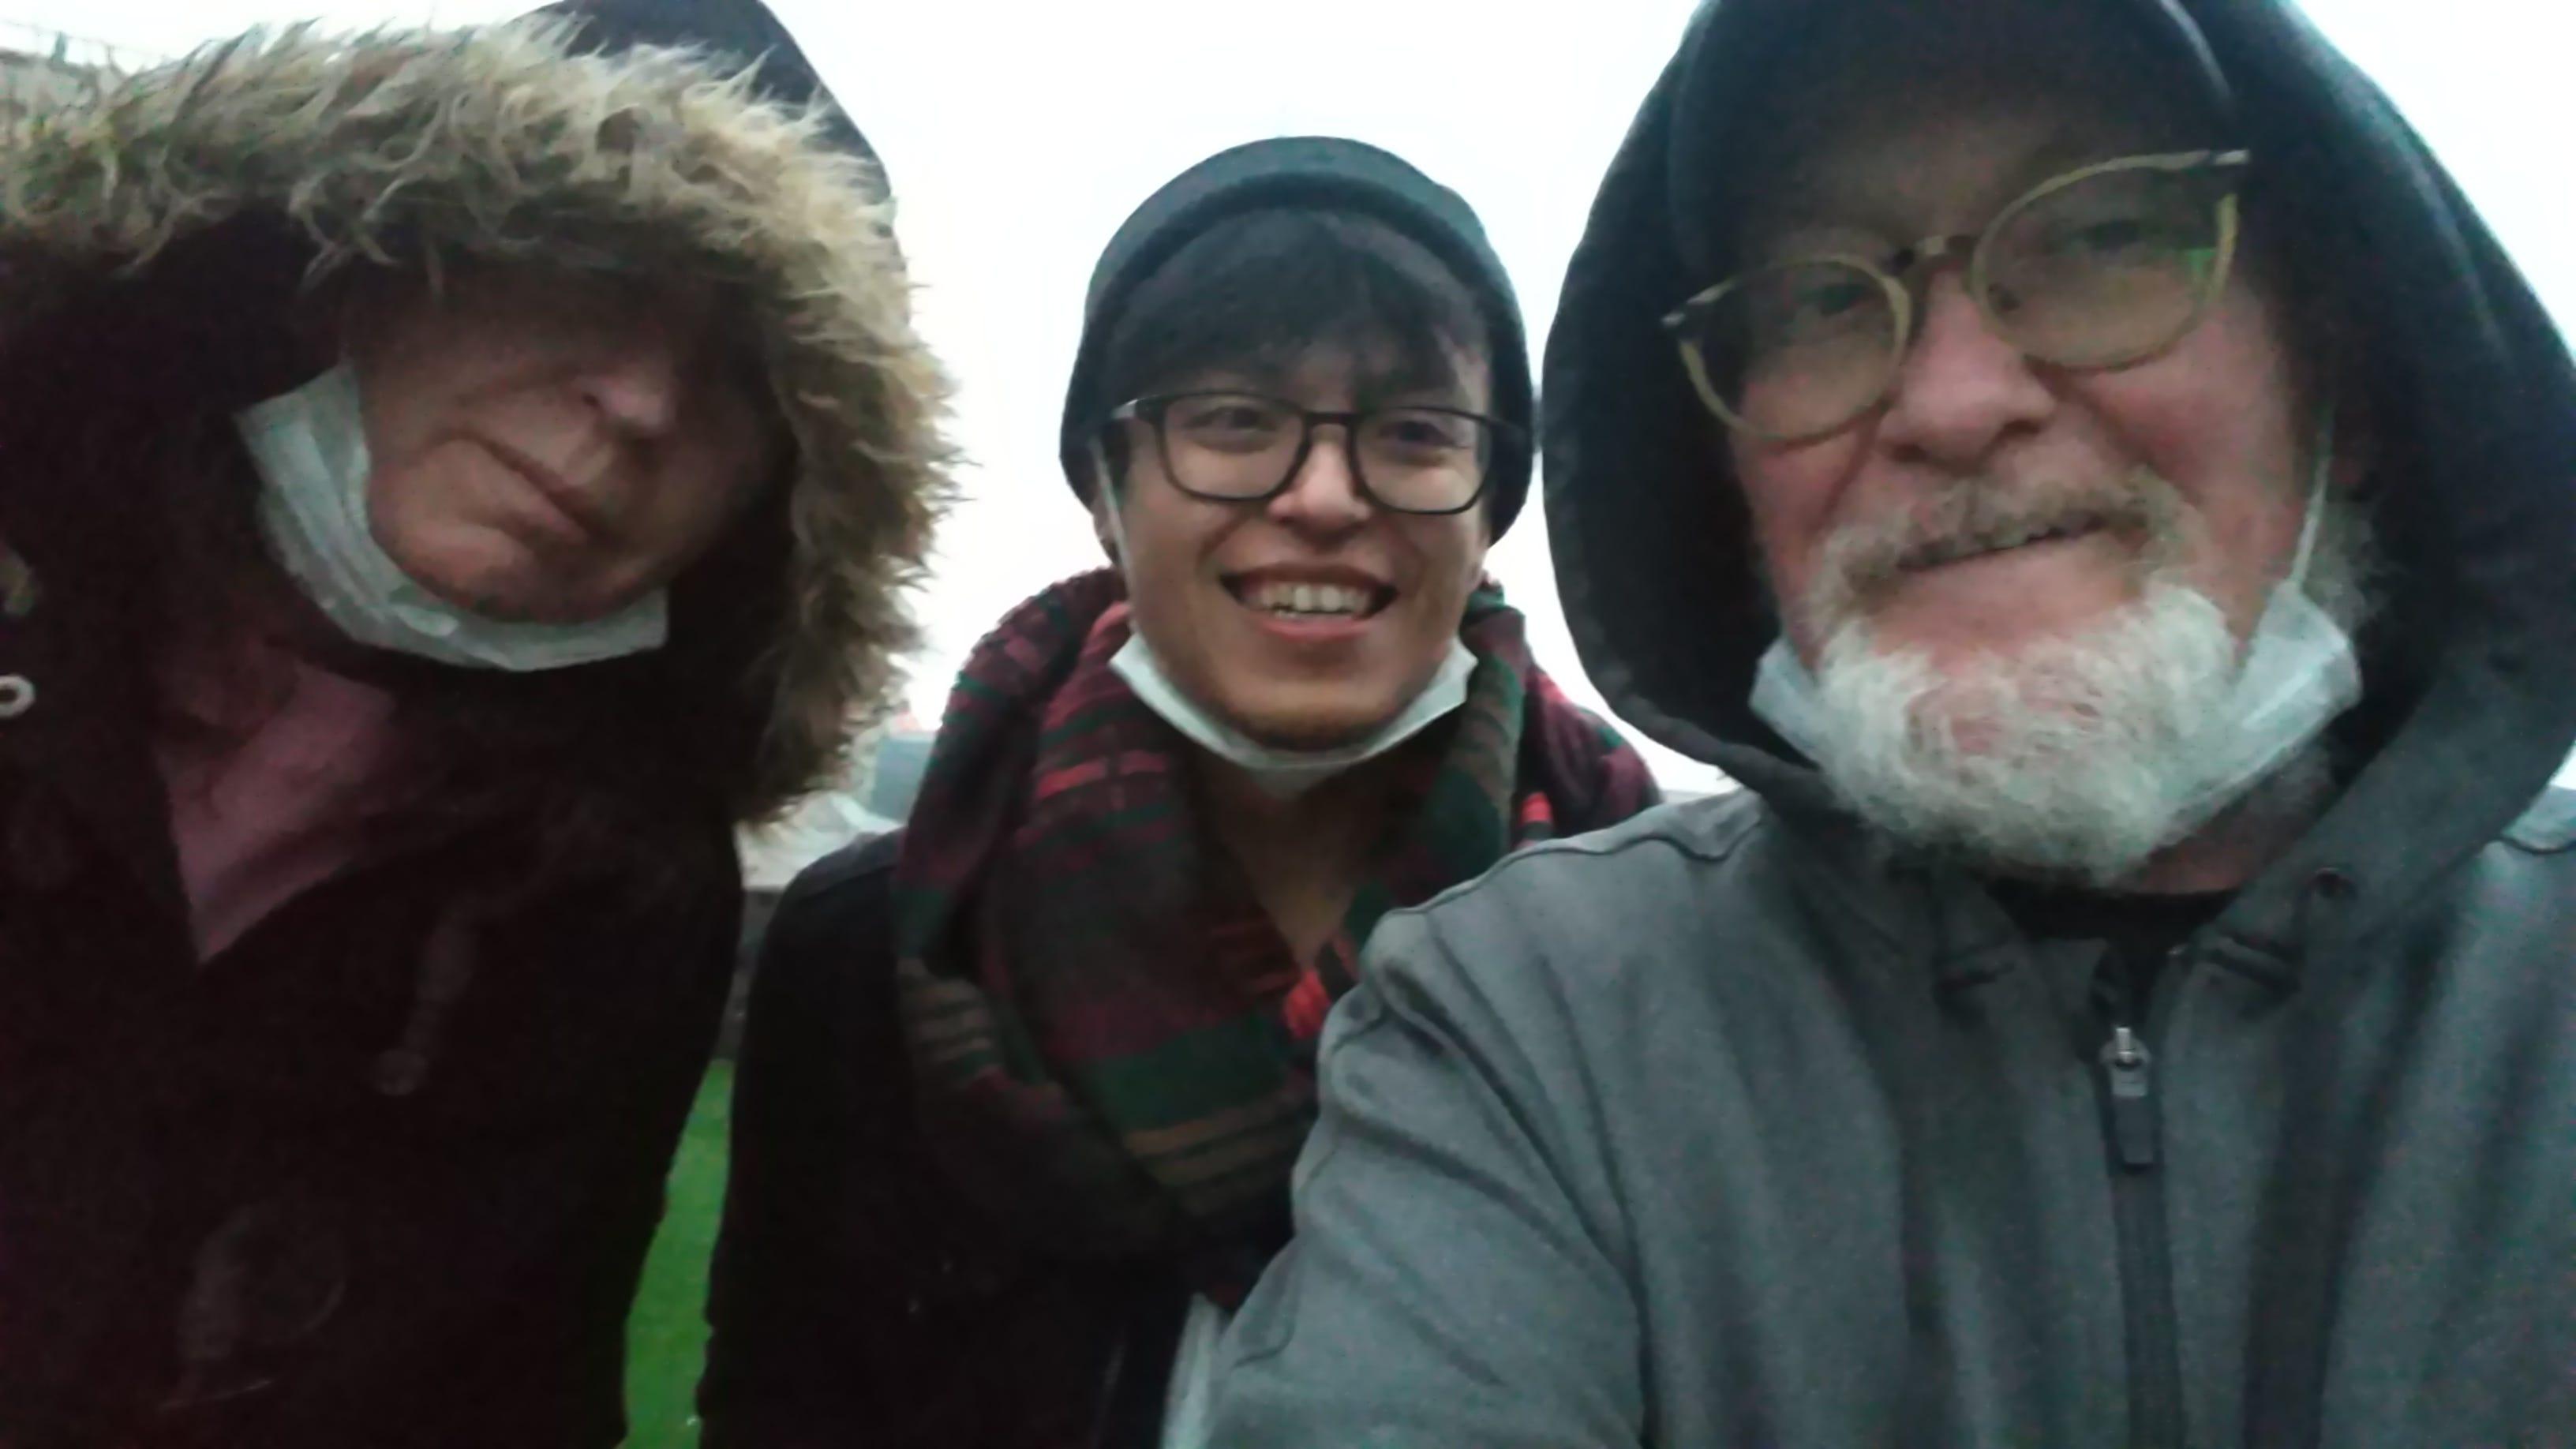 Rooftop shot with Liz Jones, Jacob Dominguez and John McGory, right, Feb 3, 2020.